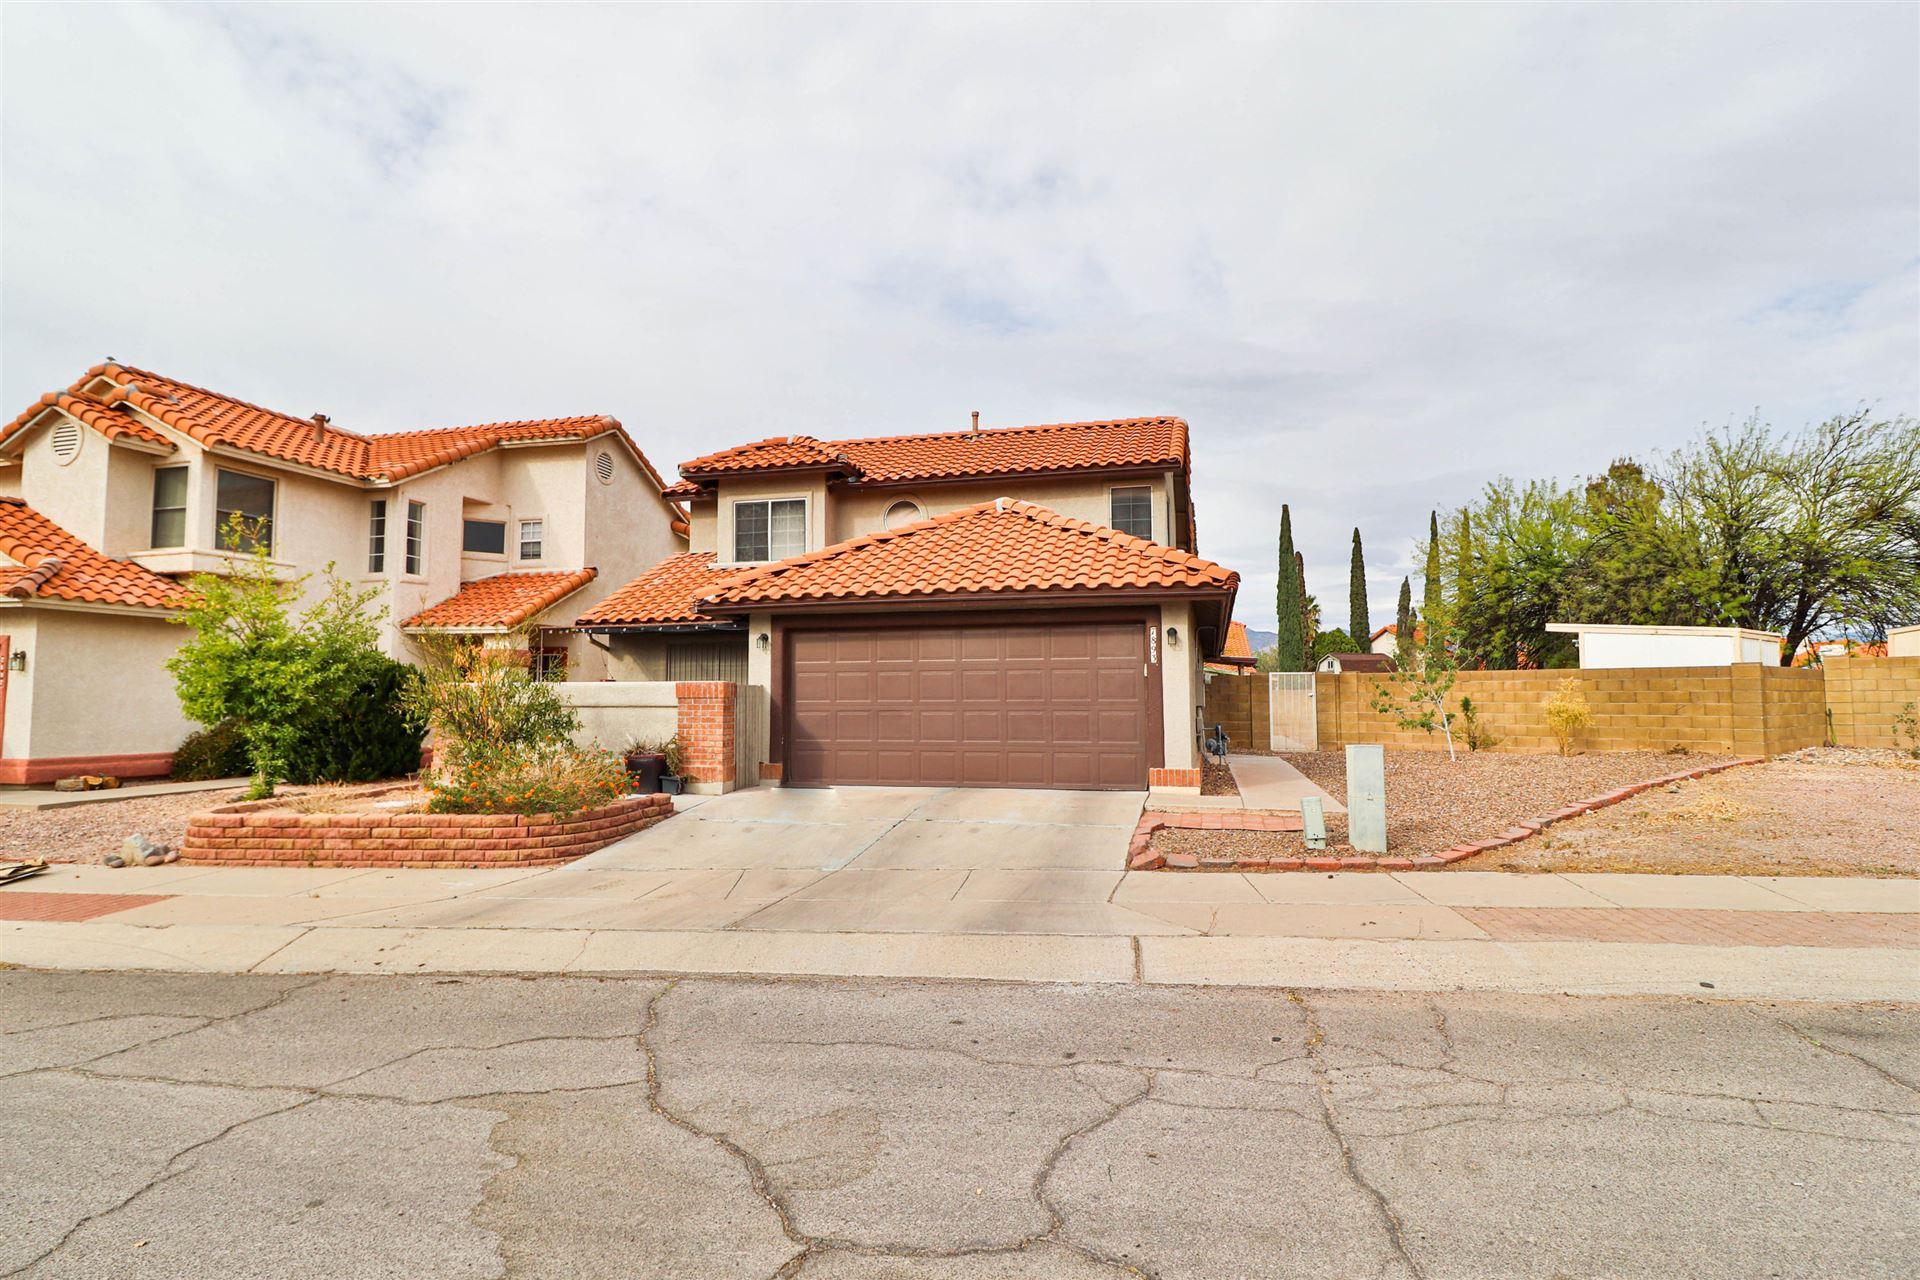 7893 S Castle Bay Street, Tucson, AZ 85747 - MLS#: 22109940